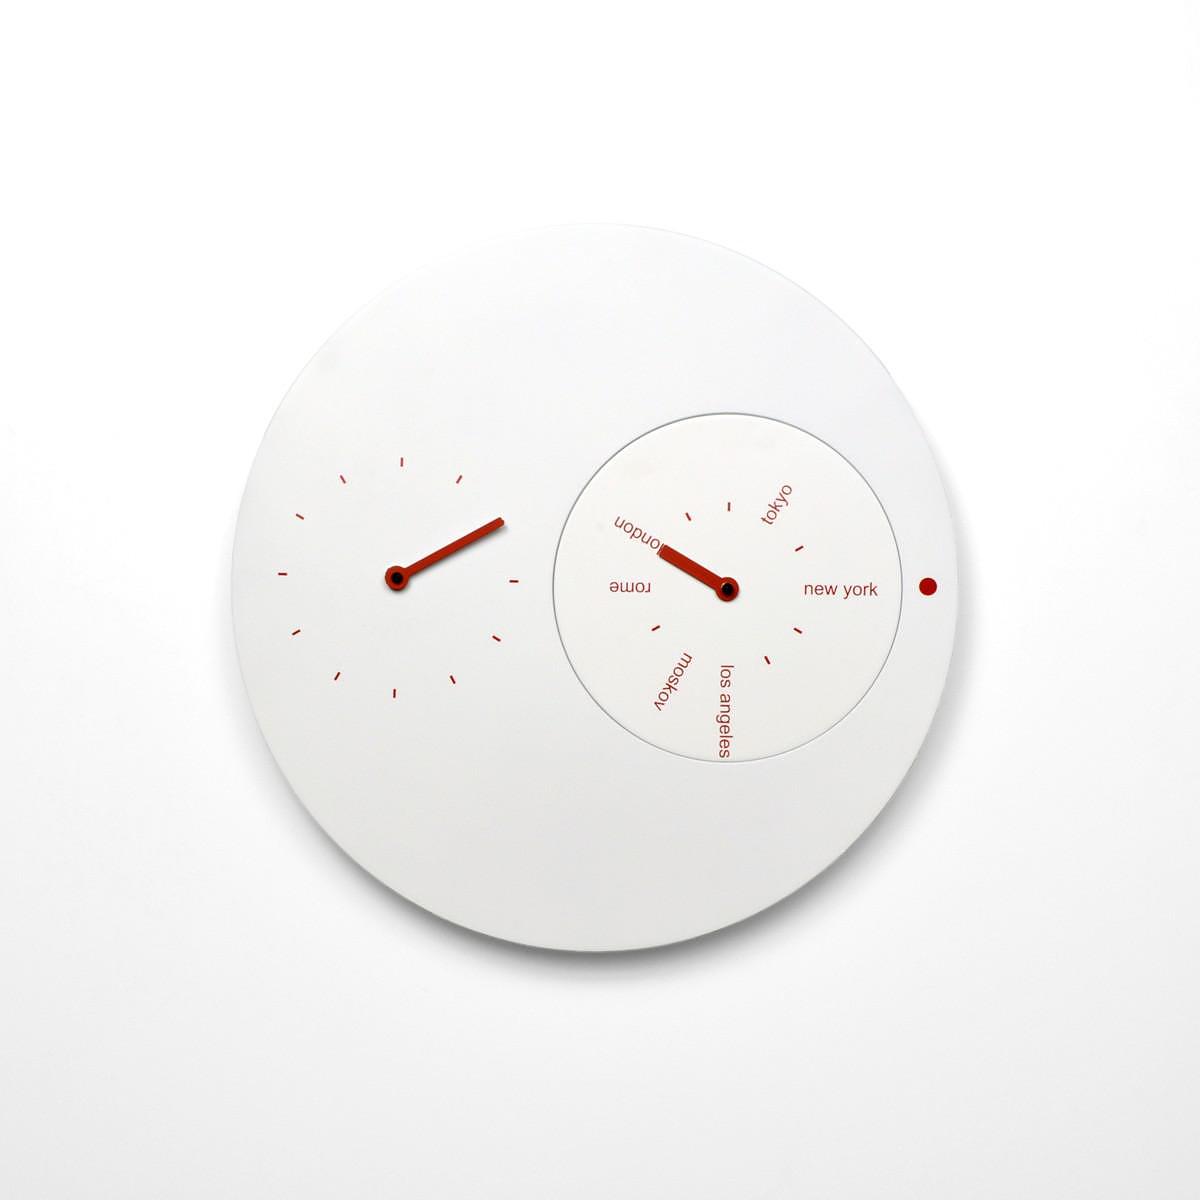 Progetti Jetlag Wall Clock by Riccardo Paollino & Matteo Fusi.